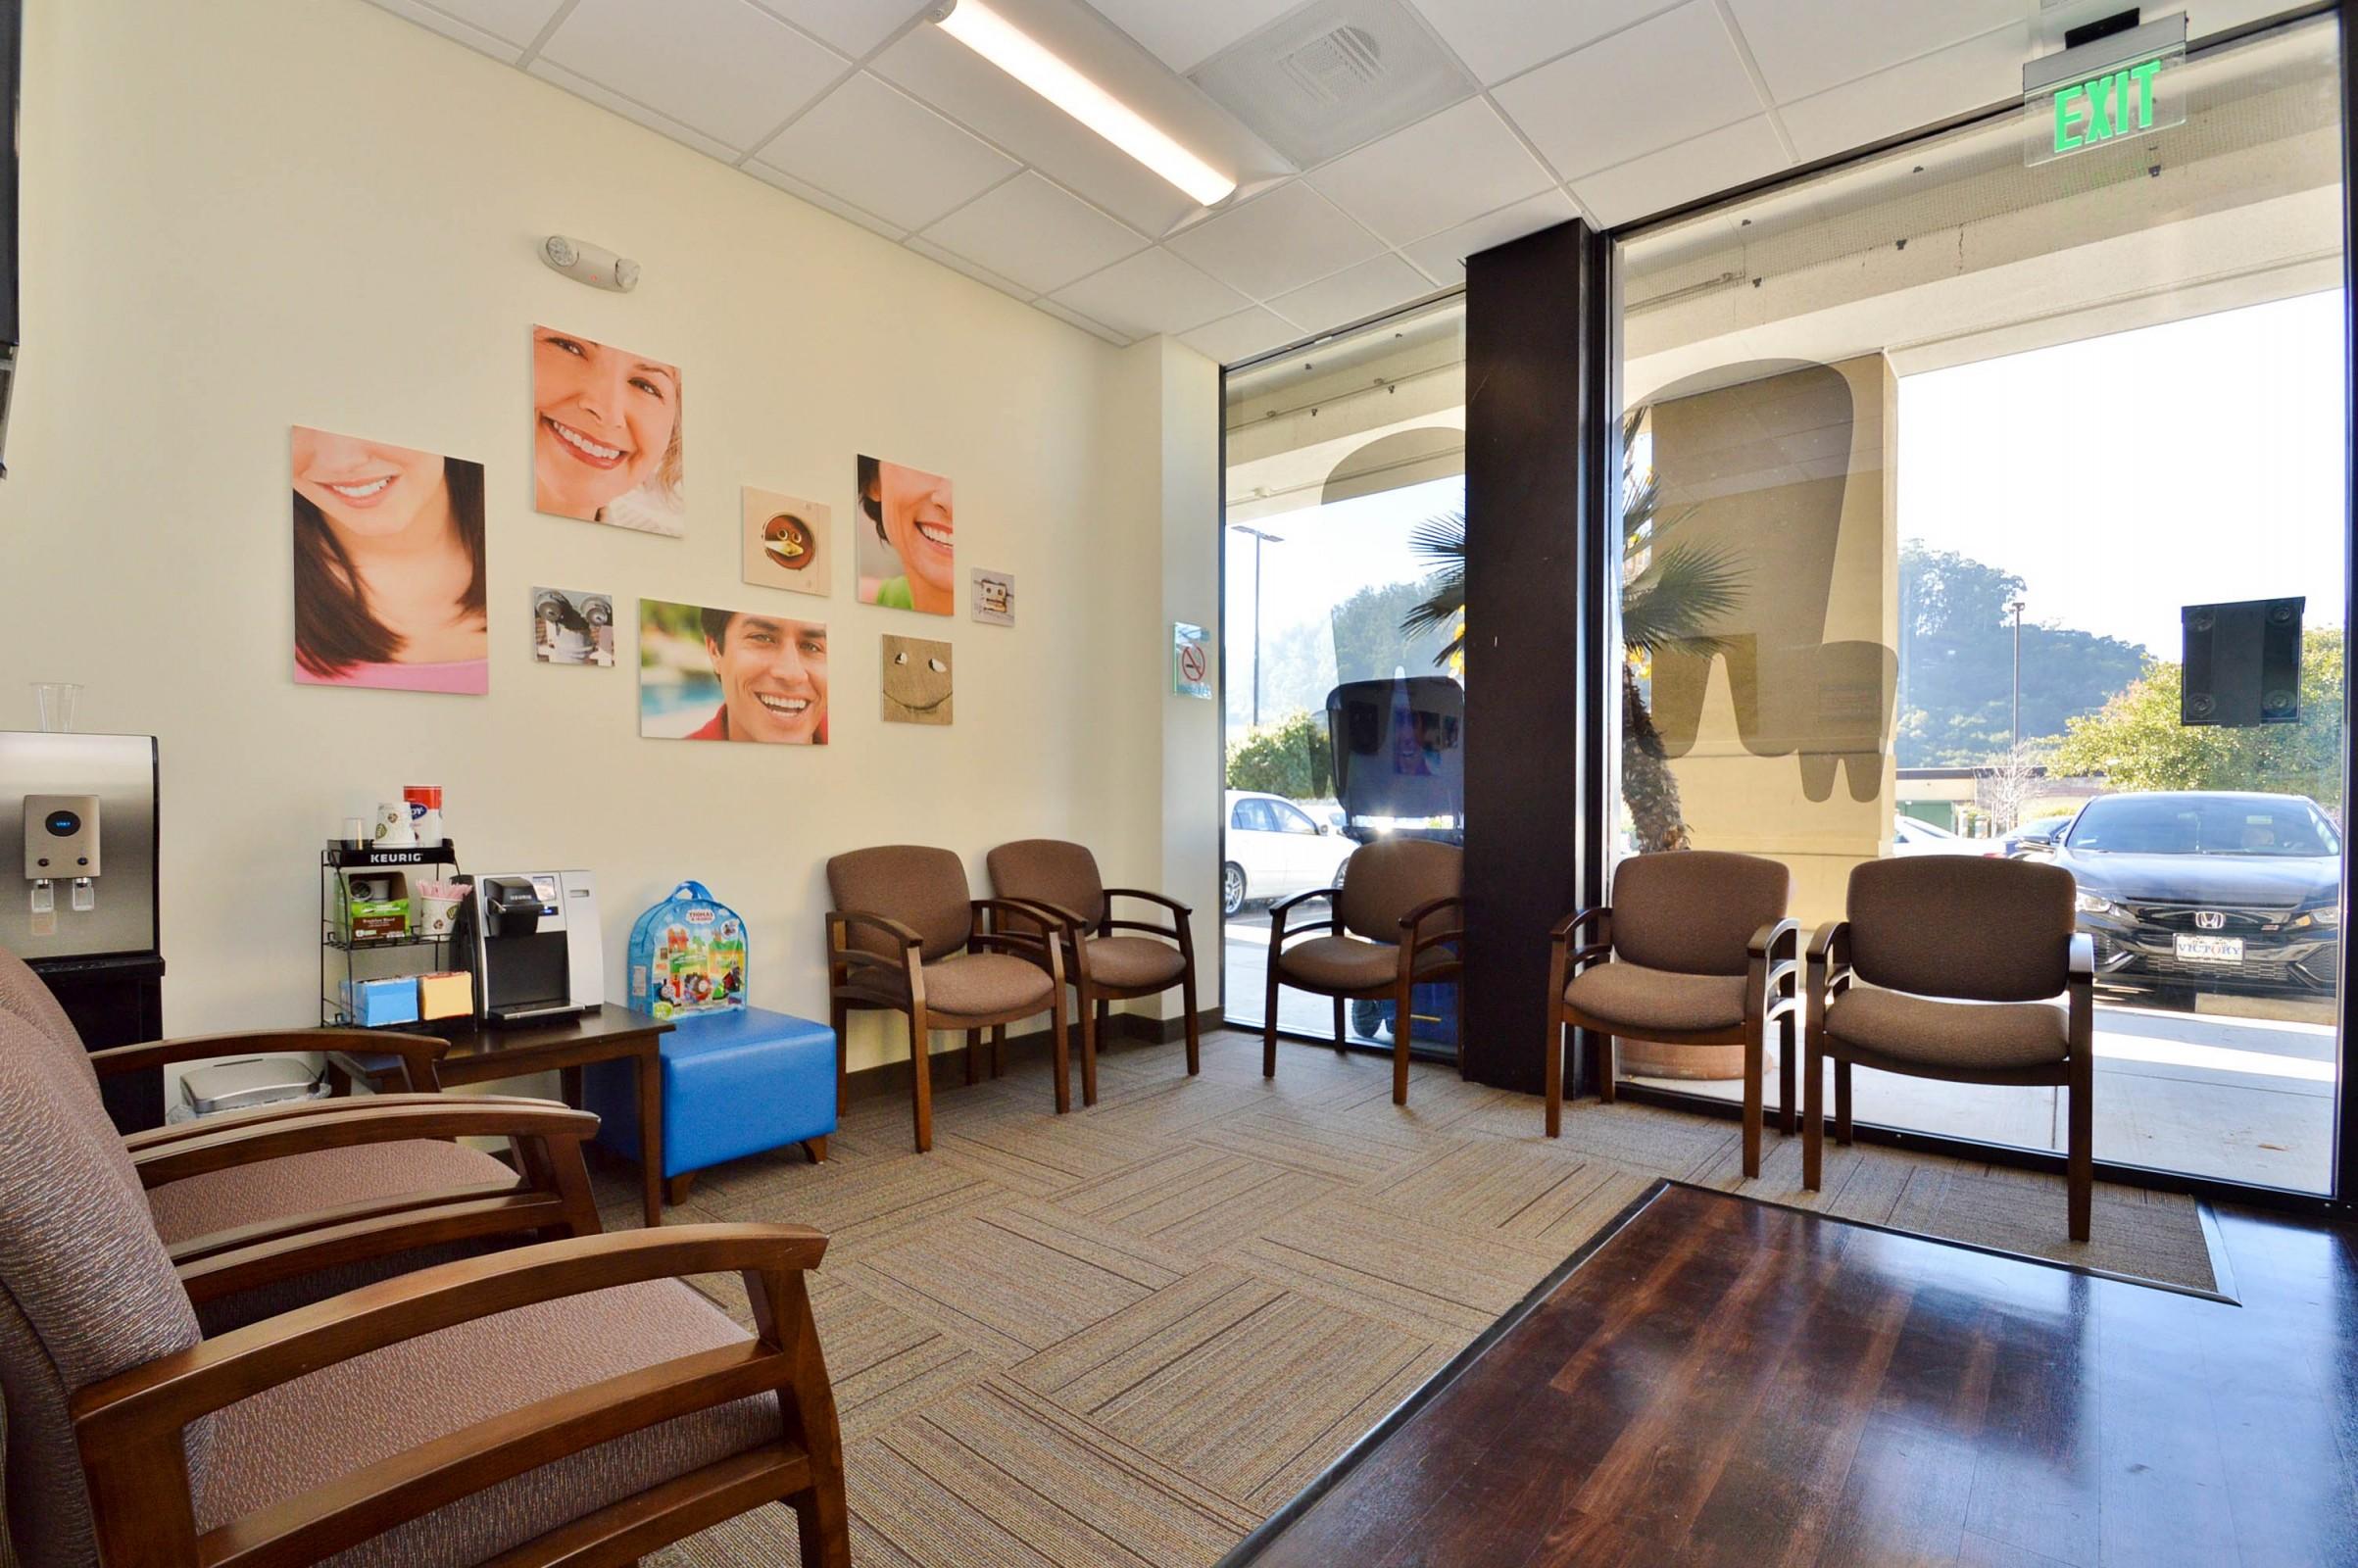 Dentists of El Cerrito Plaza image 4